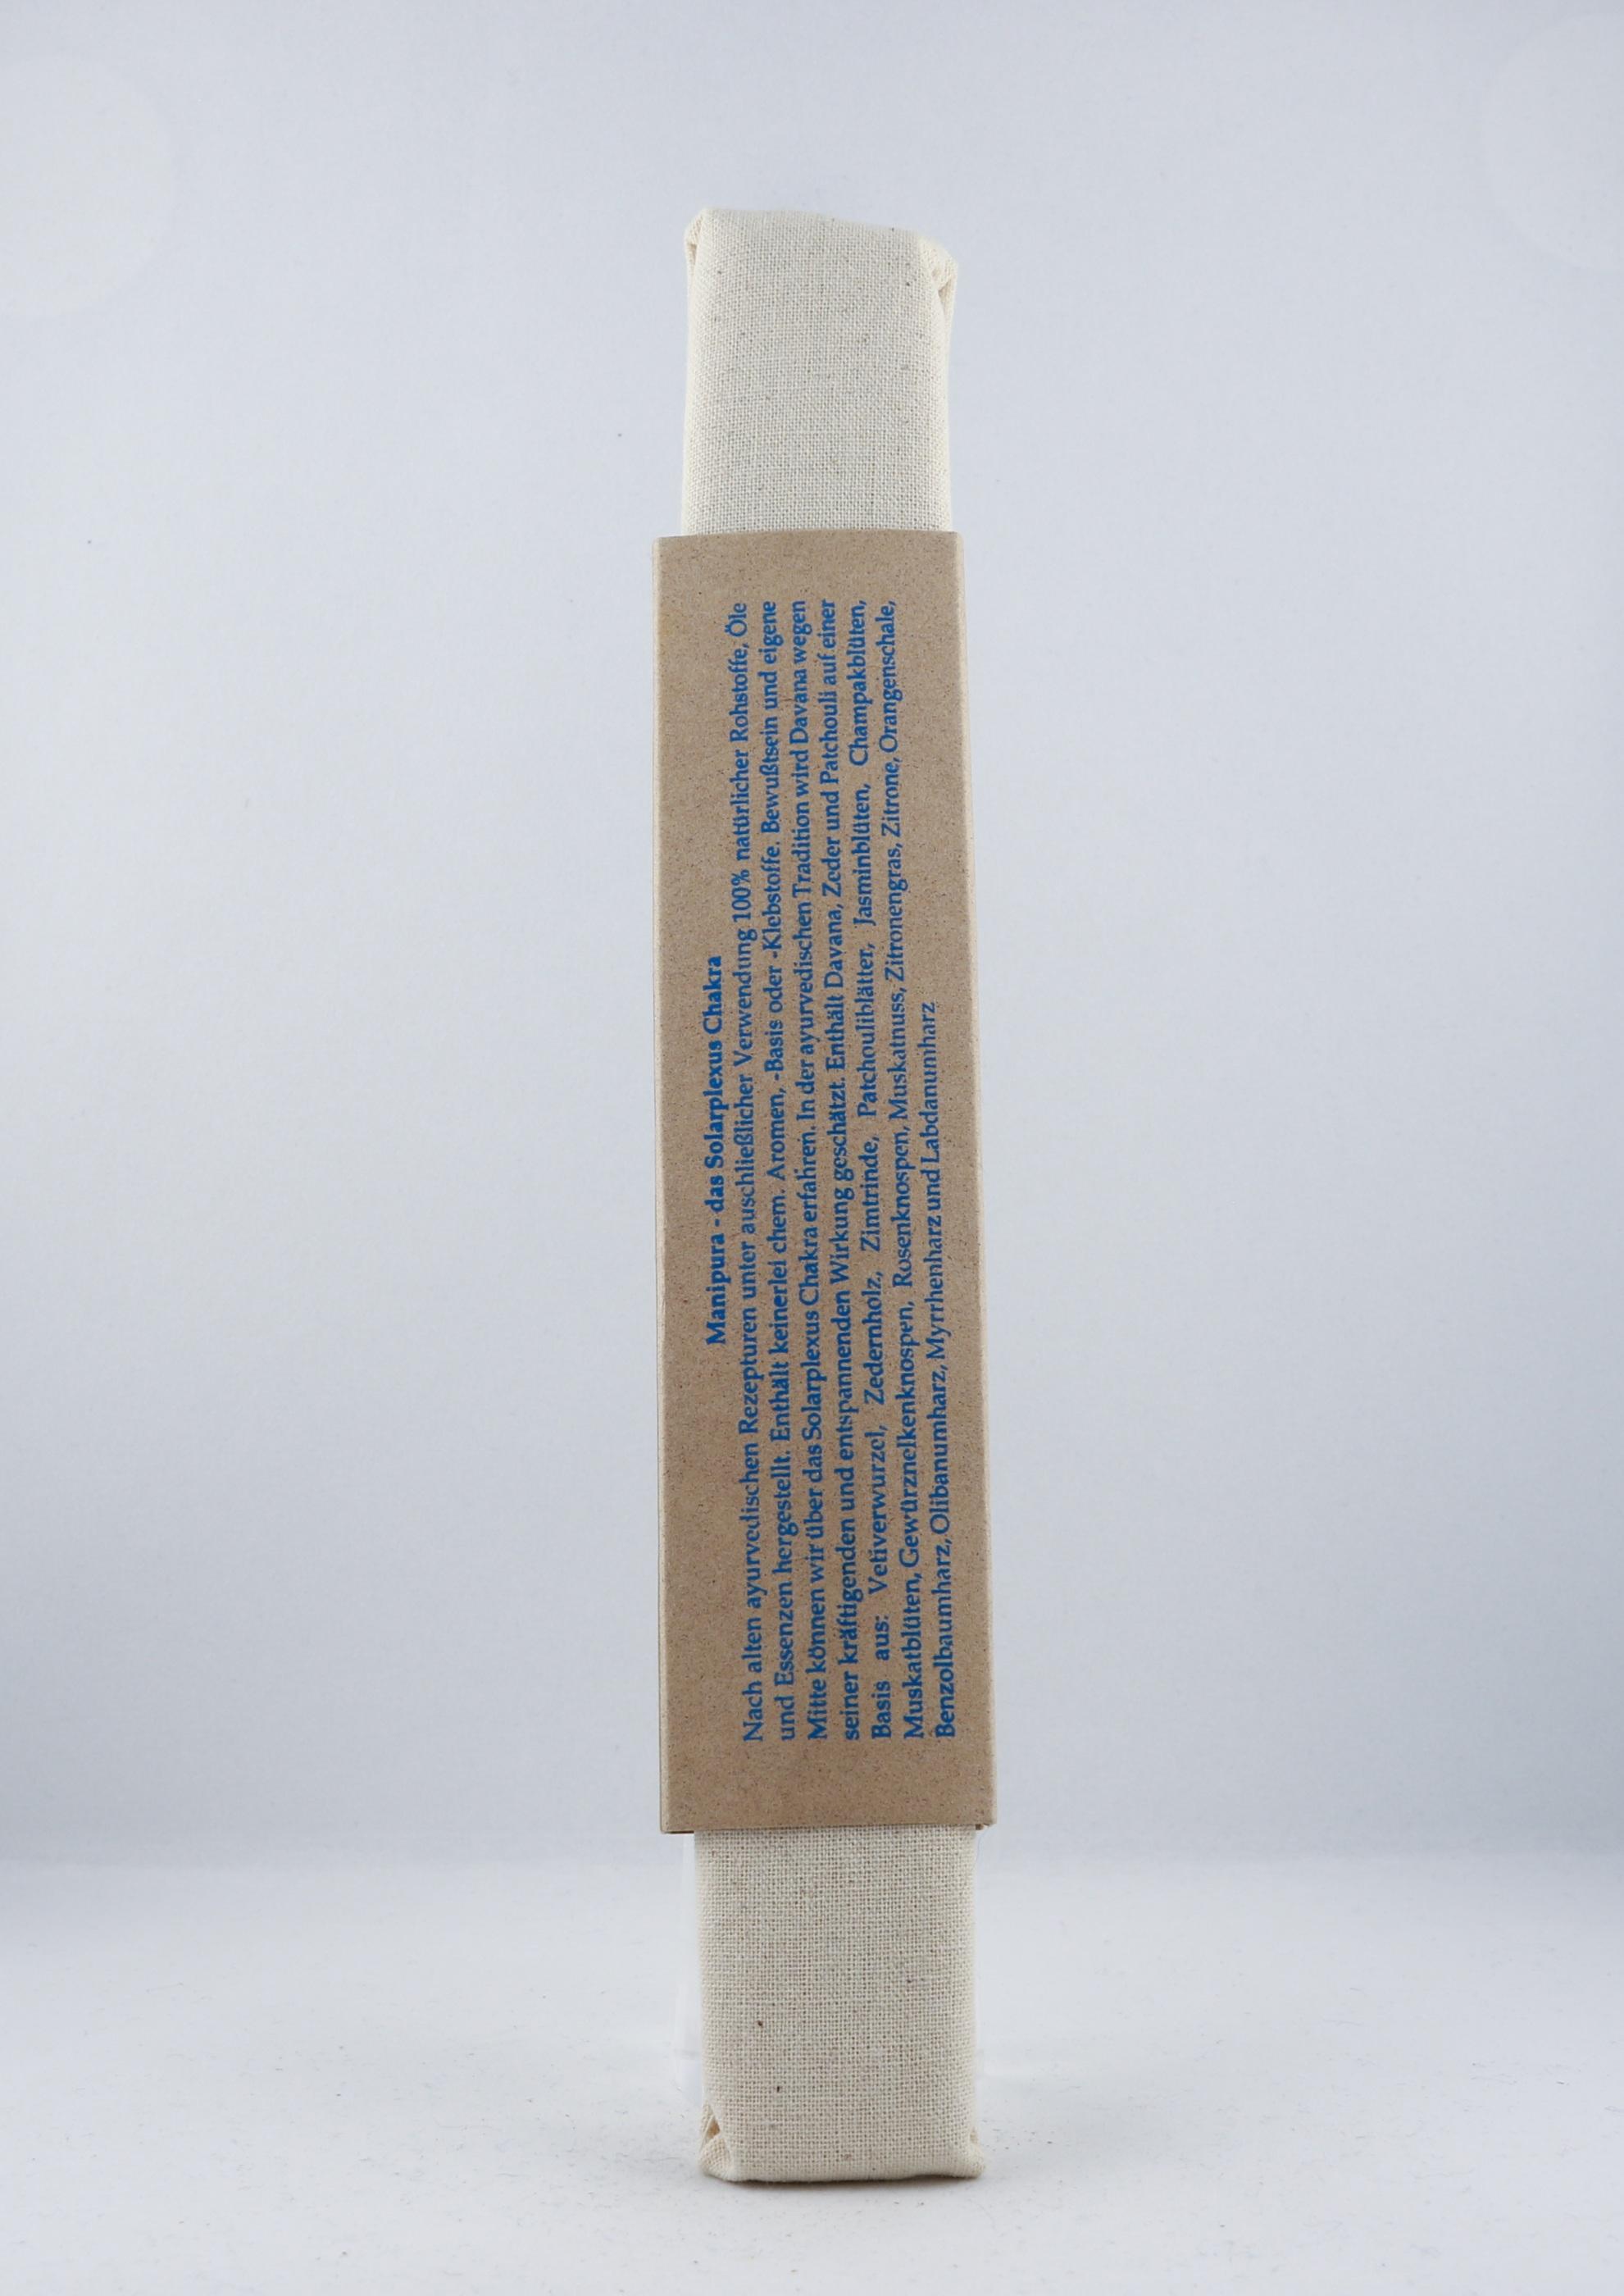 Solarplexus Chakra 3 Davana rökelse wellness ayurveda halmstad sweden svensk aroma aromer